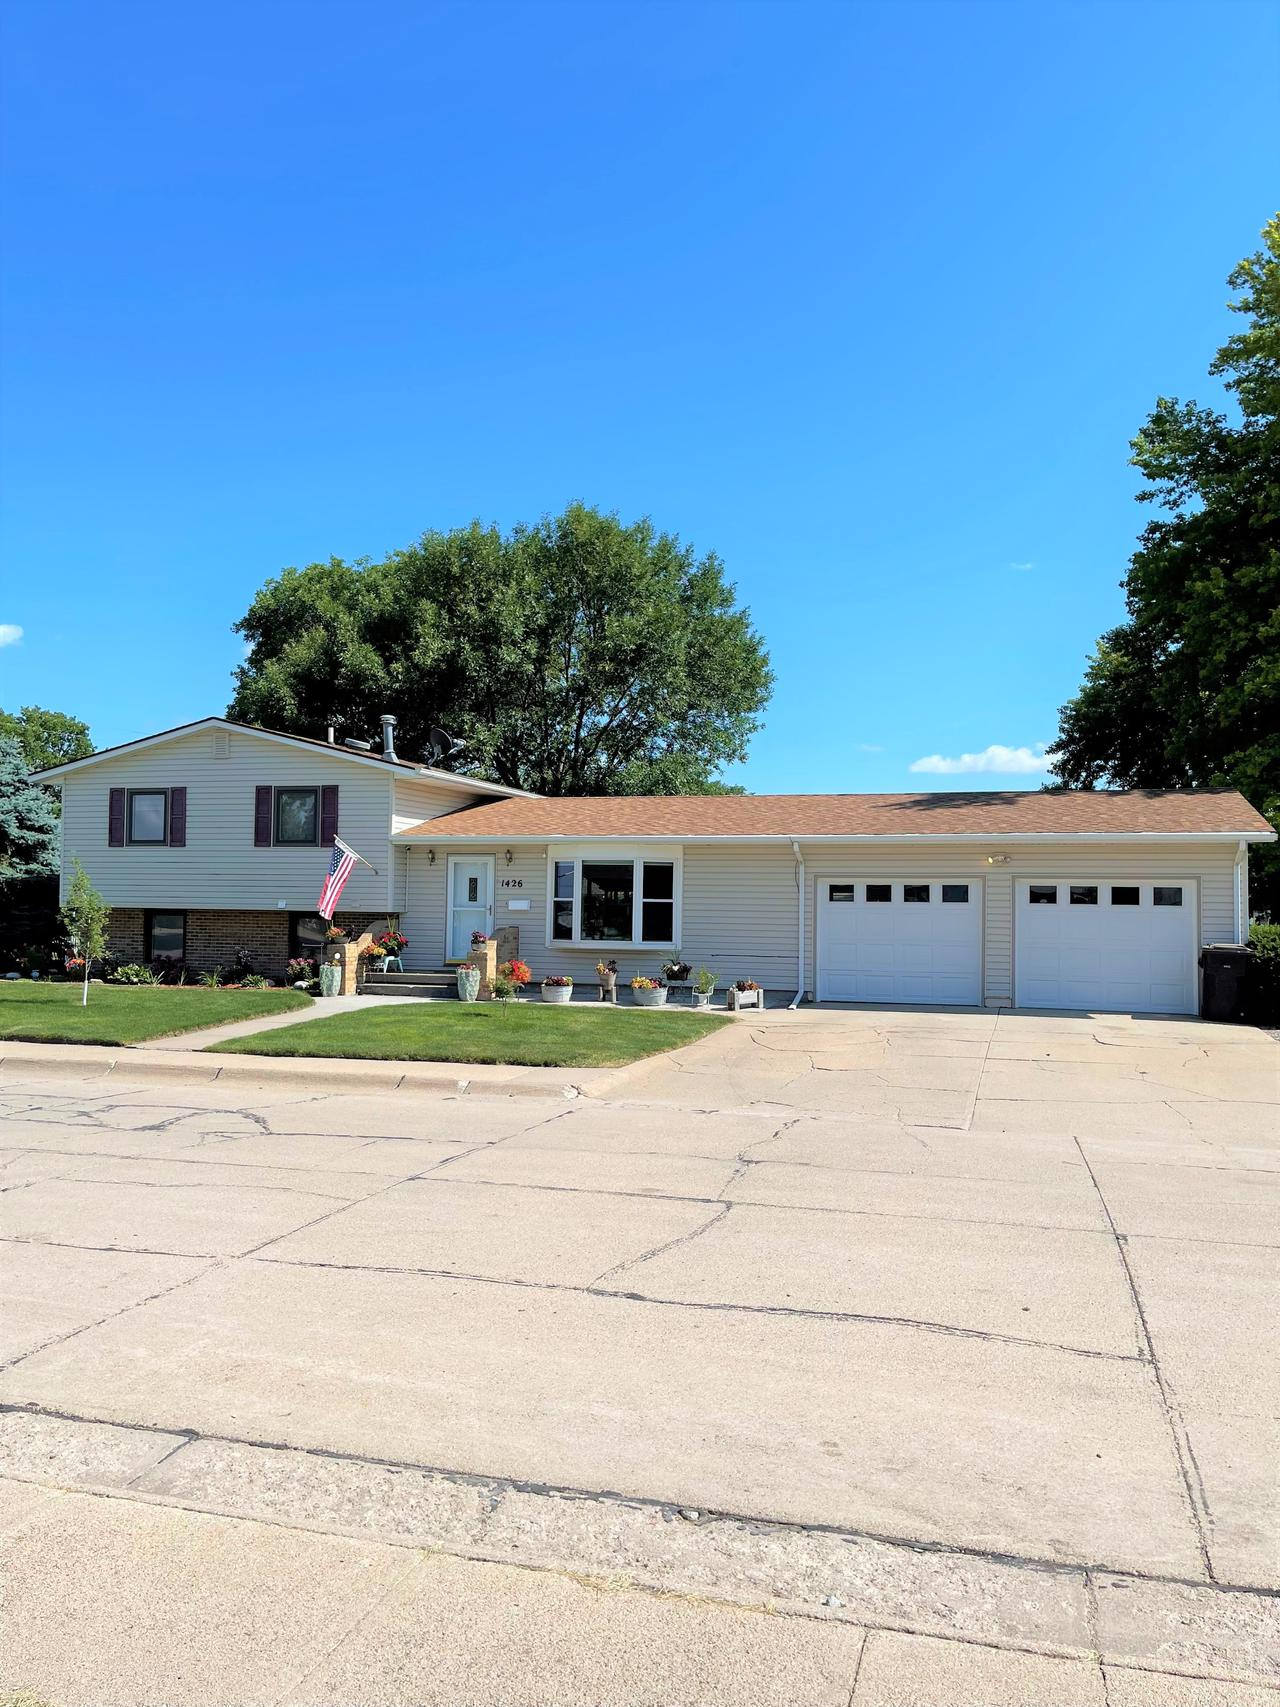 1426 7th Ave. Holdrege, NE 68949